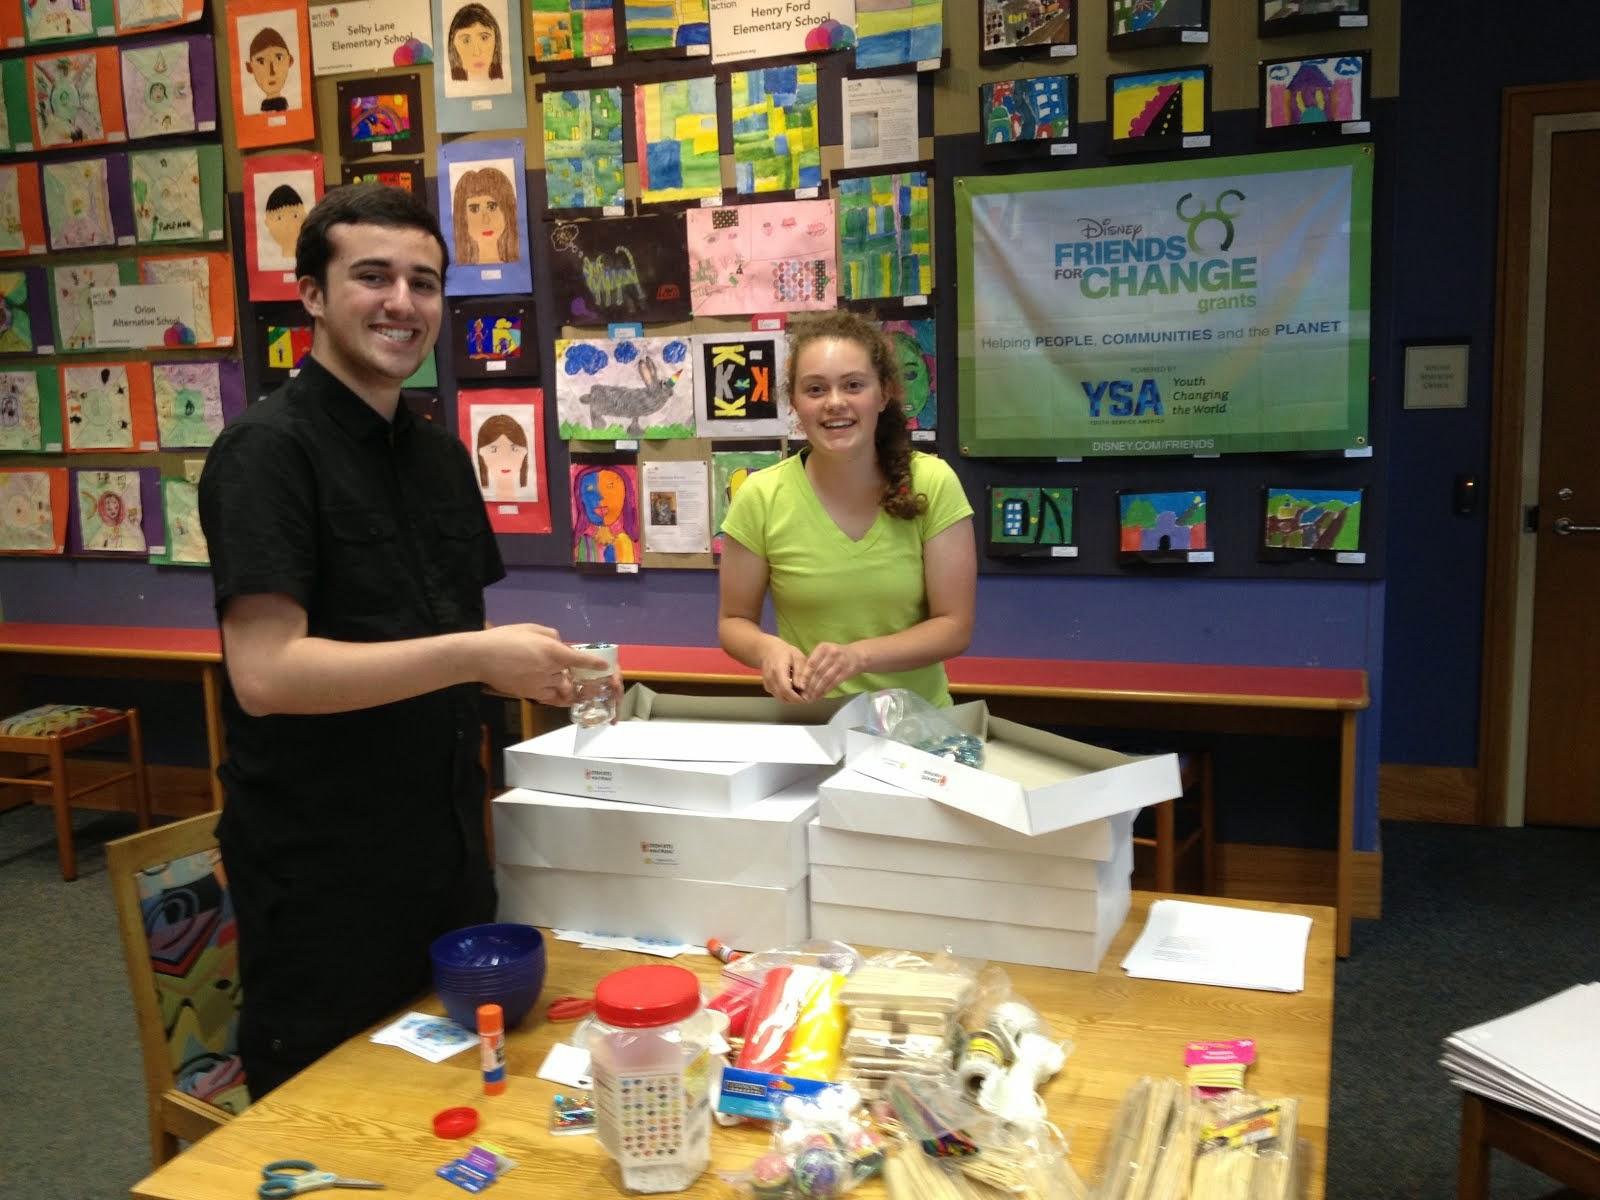 Putting together FREE STEM kits for kids